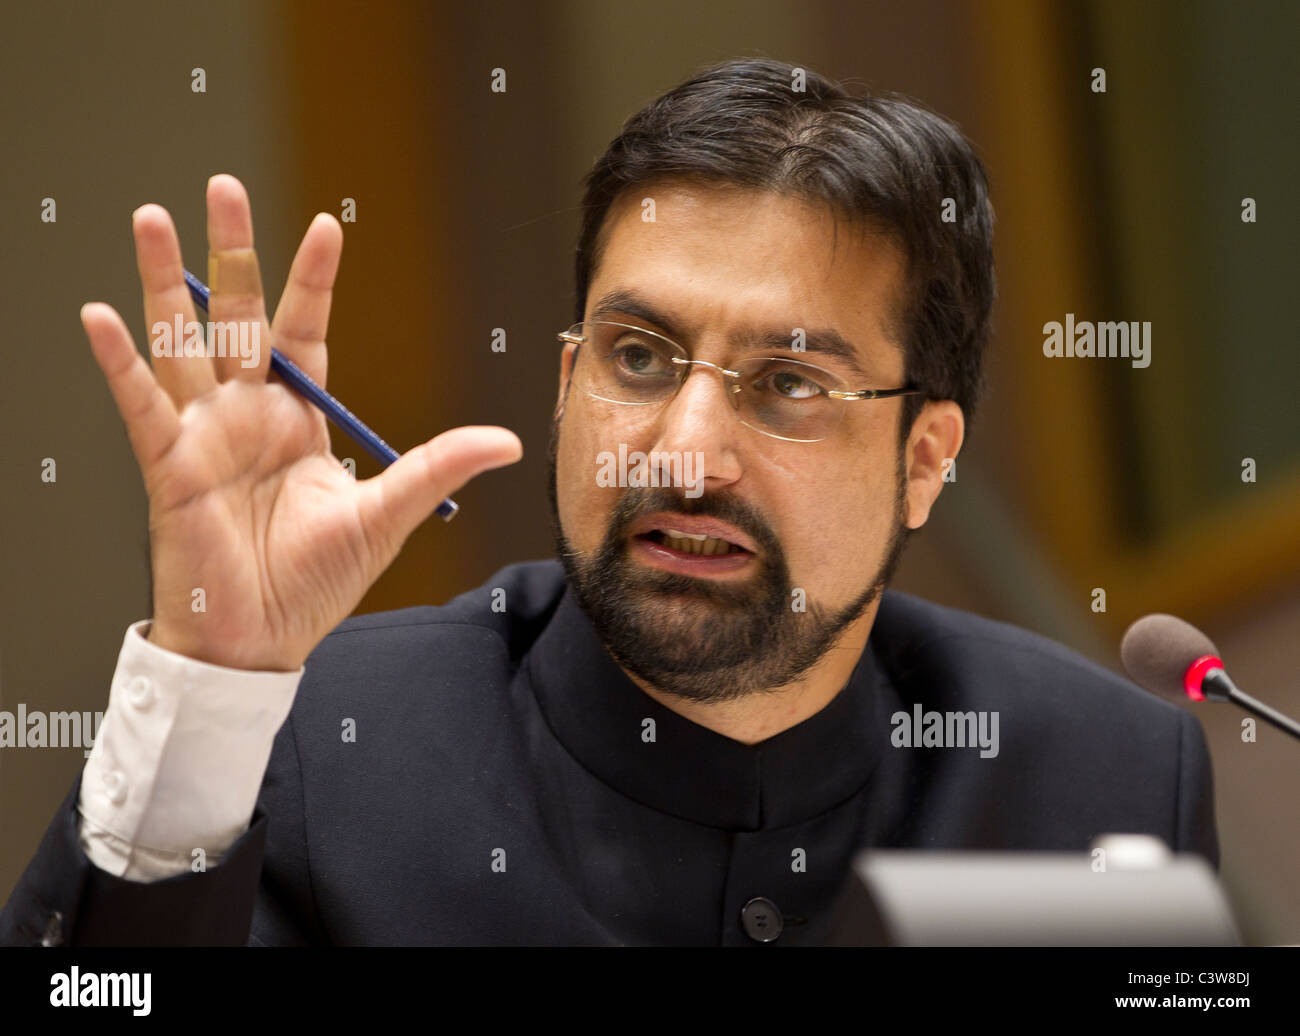 Mirwaiz Umer Farooq, Chairman, All Parties Hurriyat Conference, Jammu and Kashmir - Stock Image